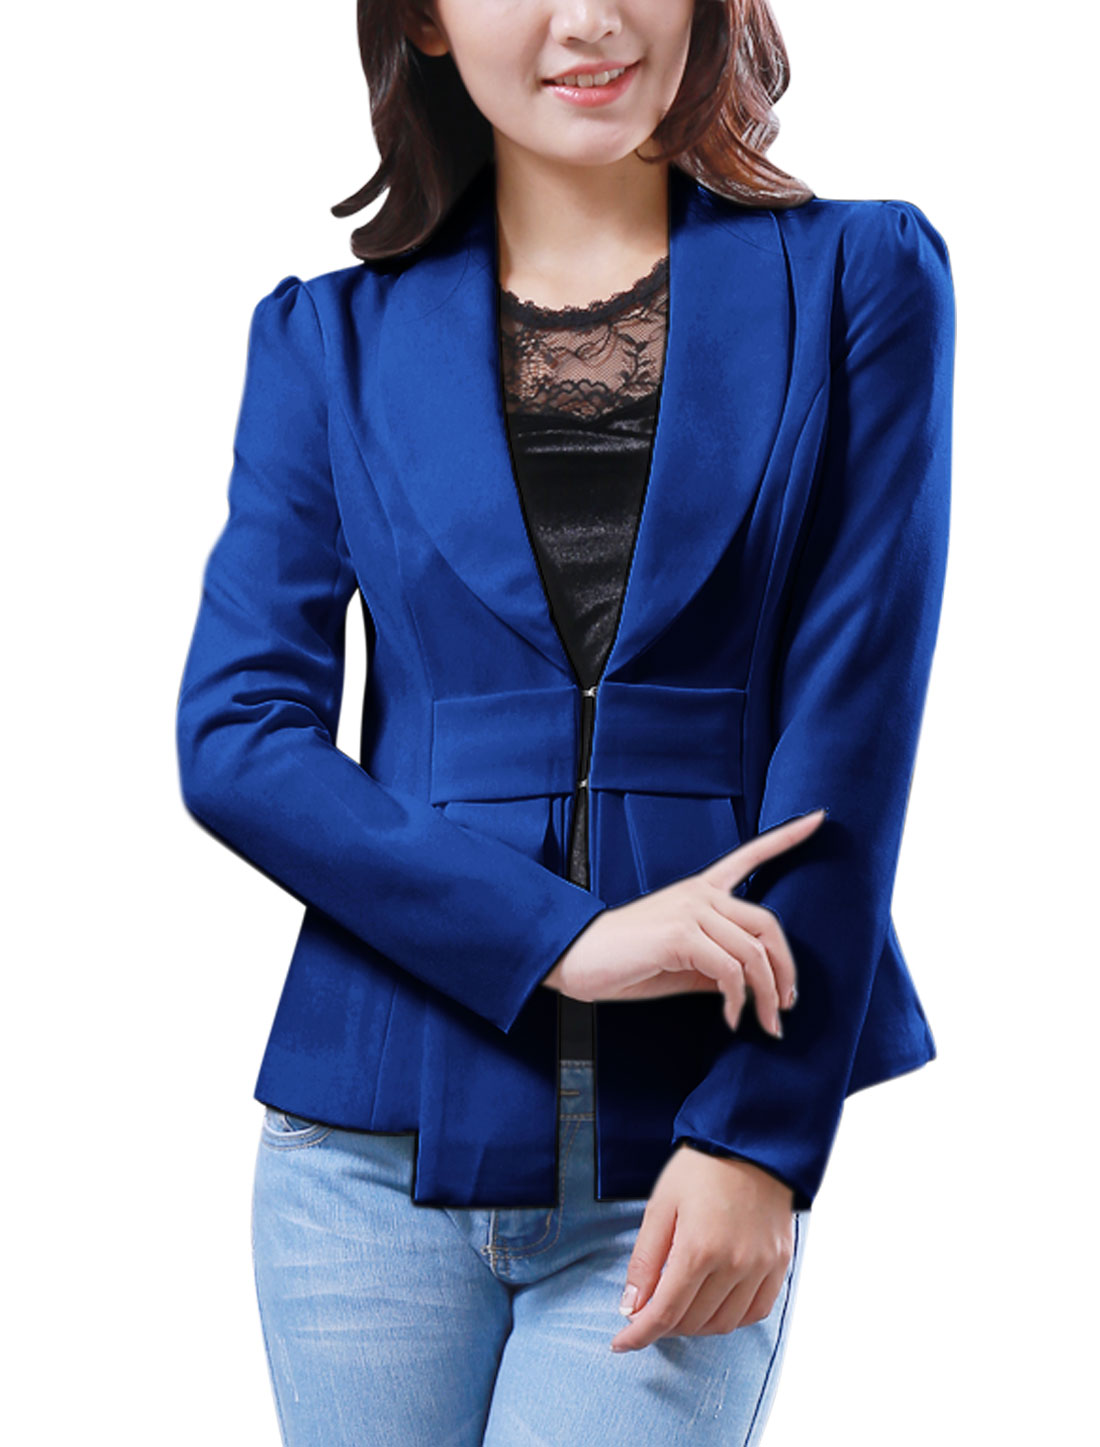 Fashion Royalblue Shawl Collar Long Sleeve Blazer Jacket for Lady L